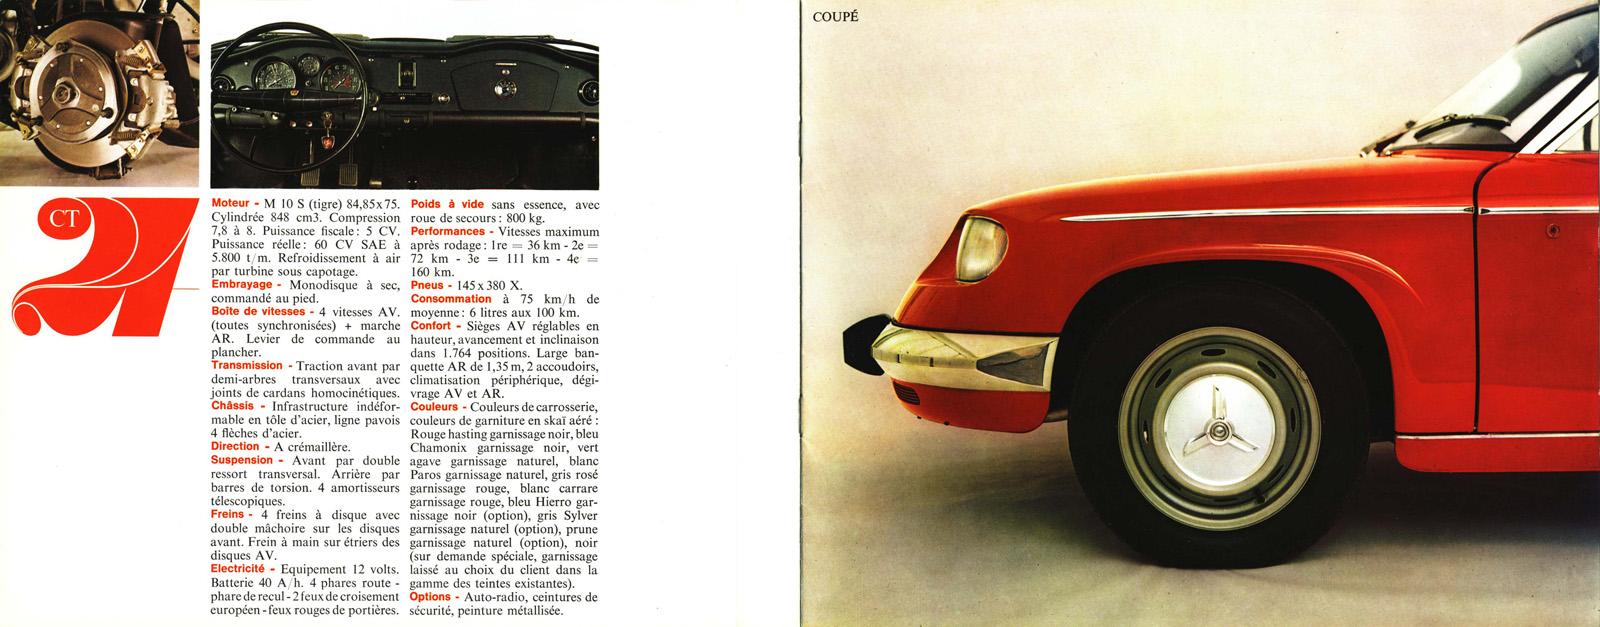 Panhard 24 Brochure